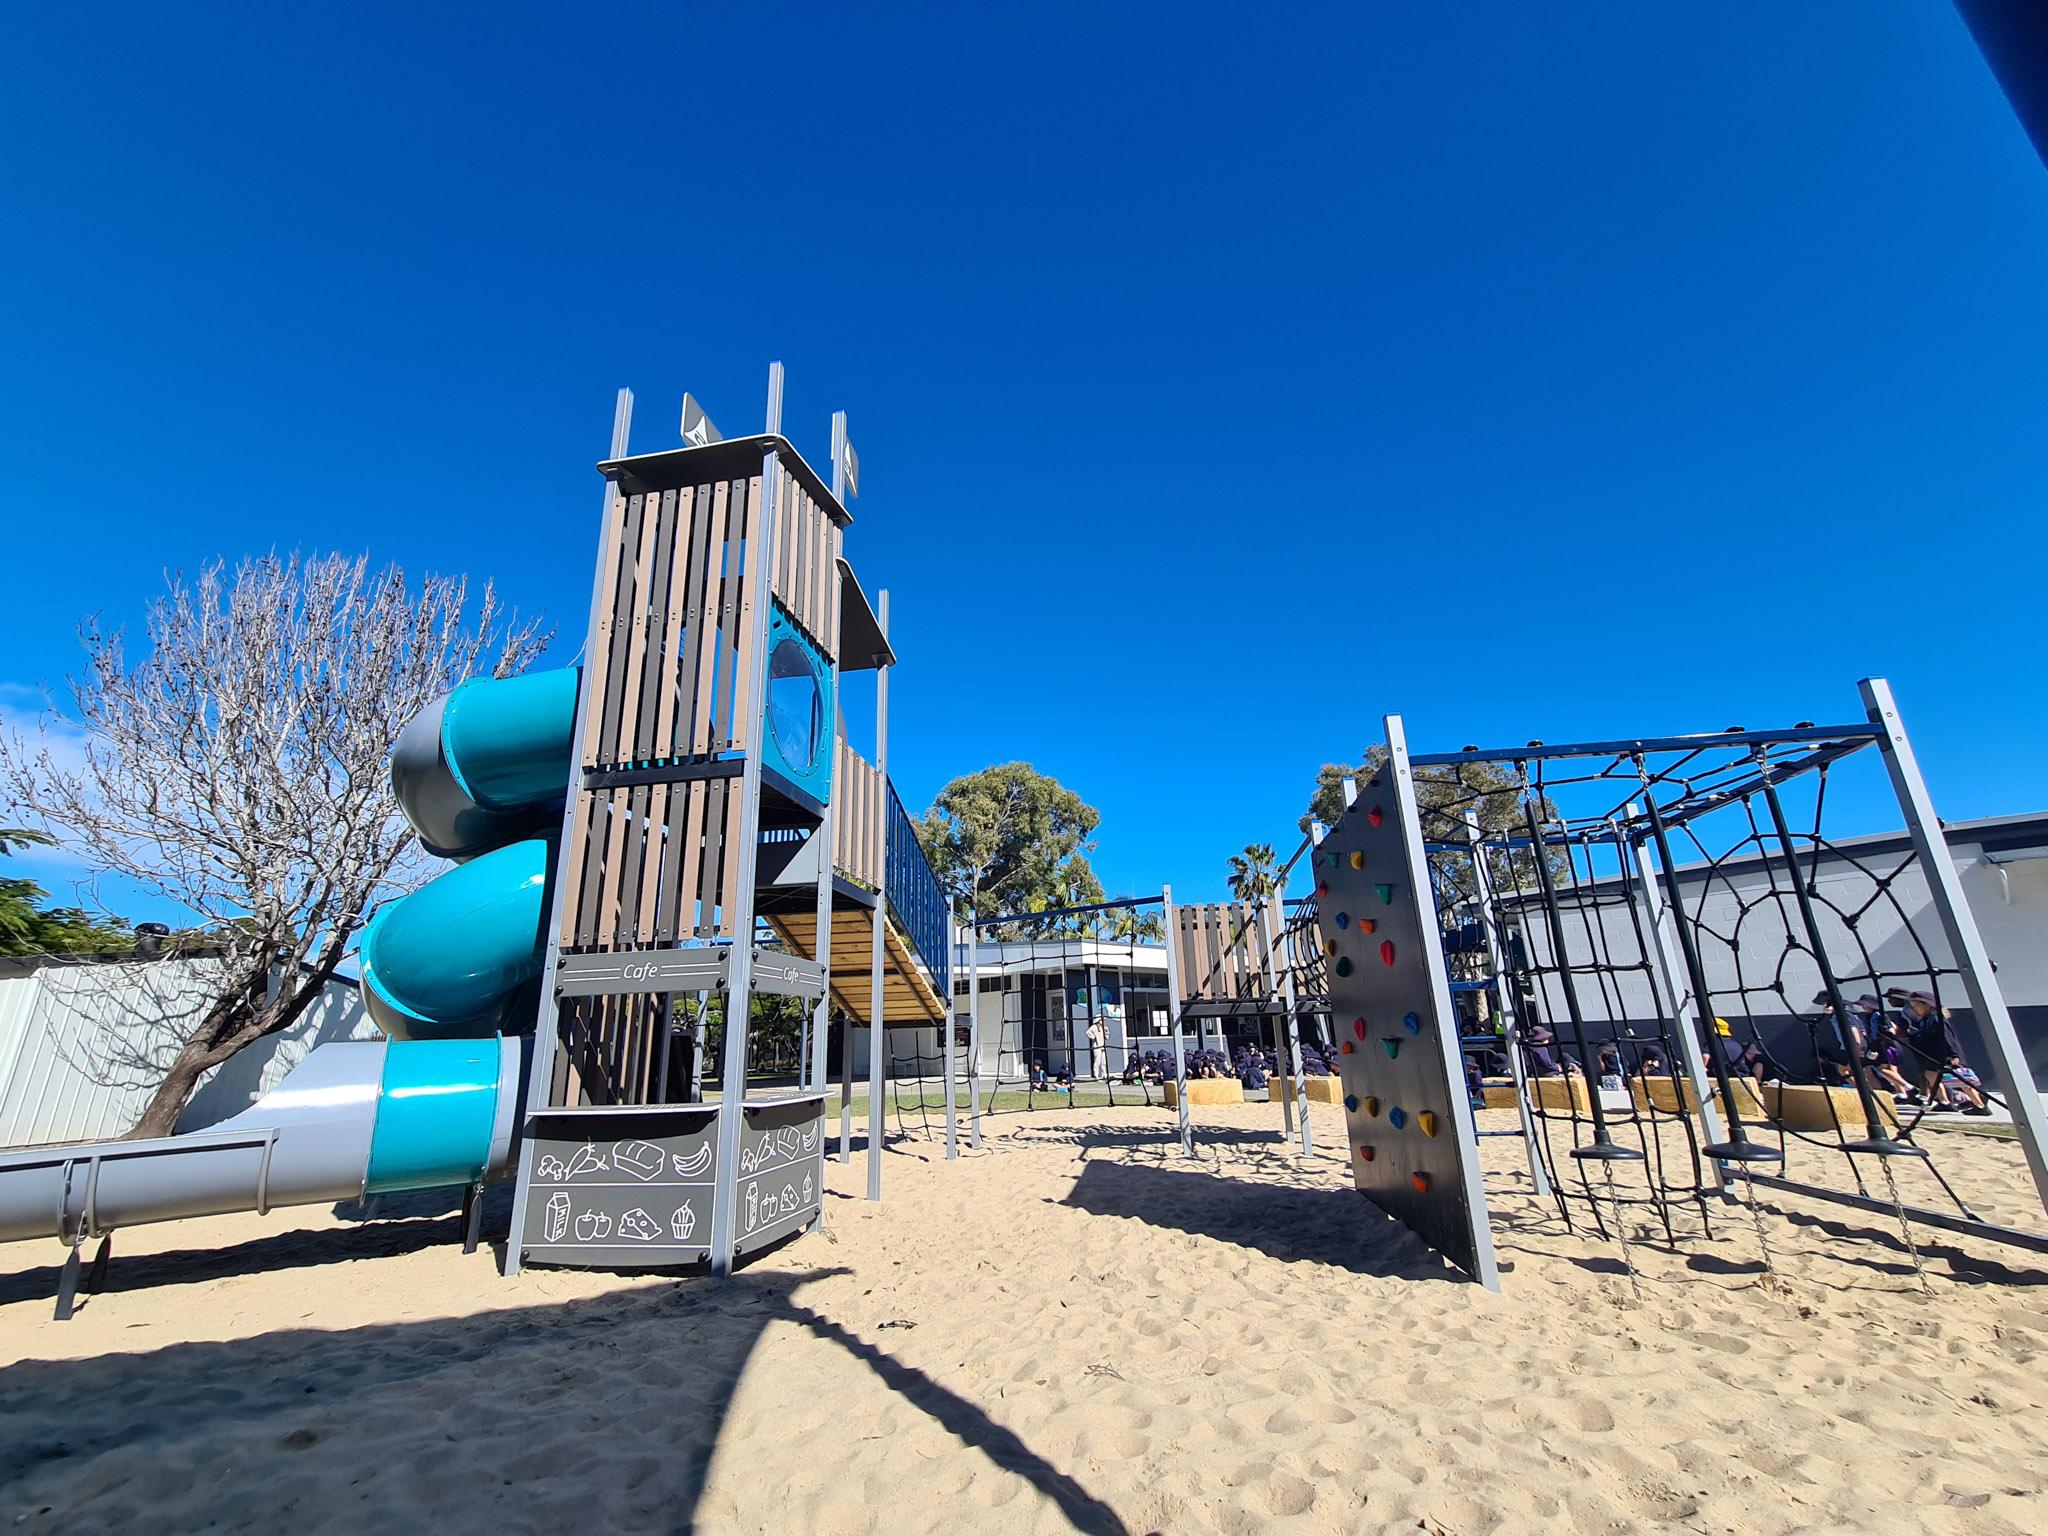 palm-beach-state-school-playrground-austek-play-06